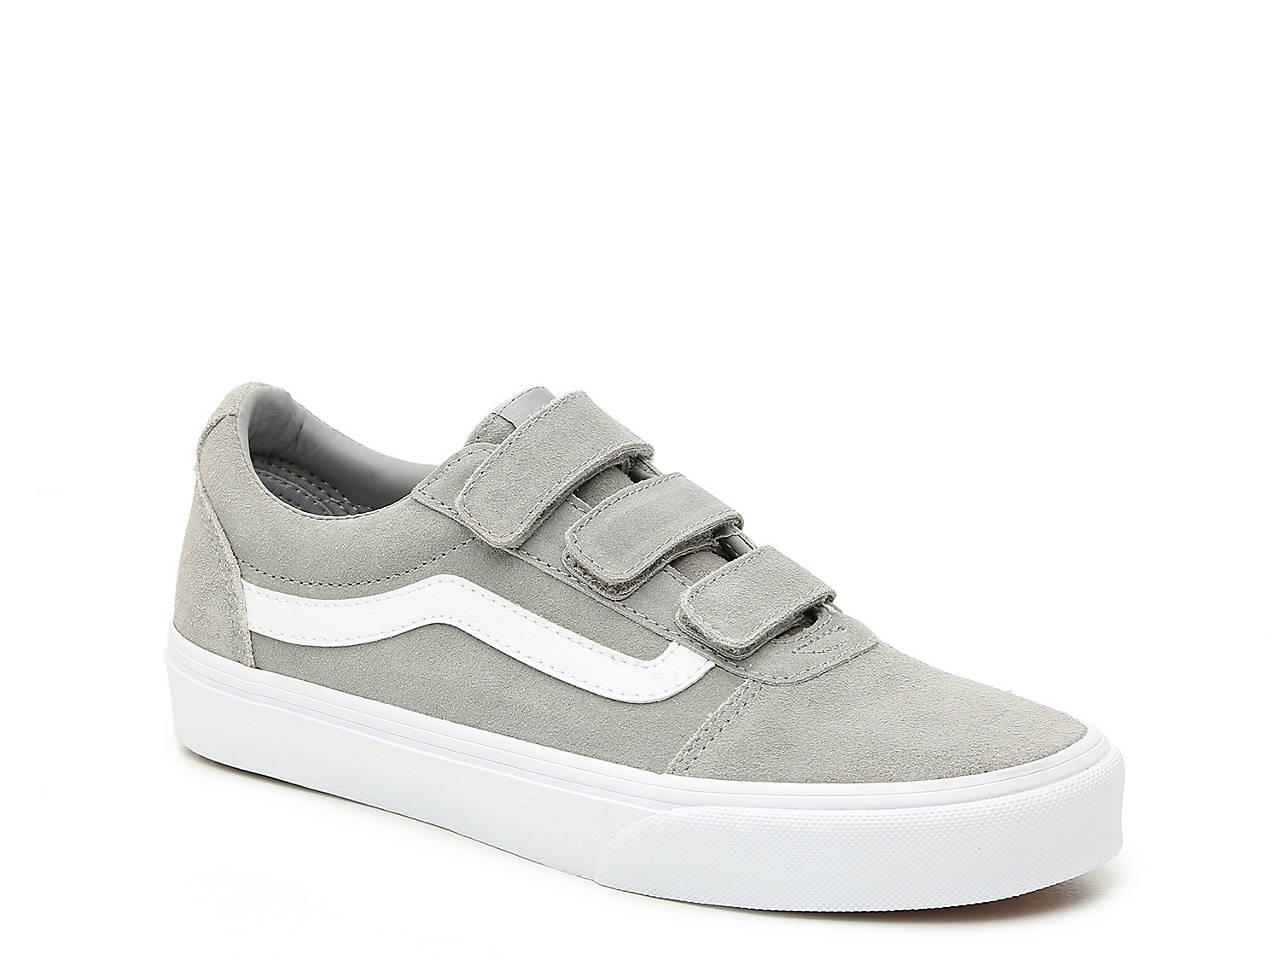 1bd1575f1c4b8f Vans Ward V Sneaker - Women s Women s Shoes